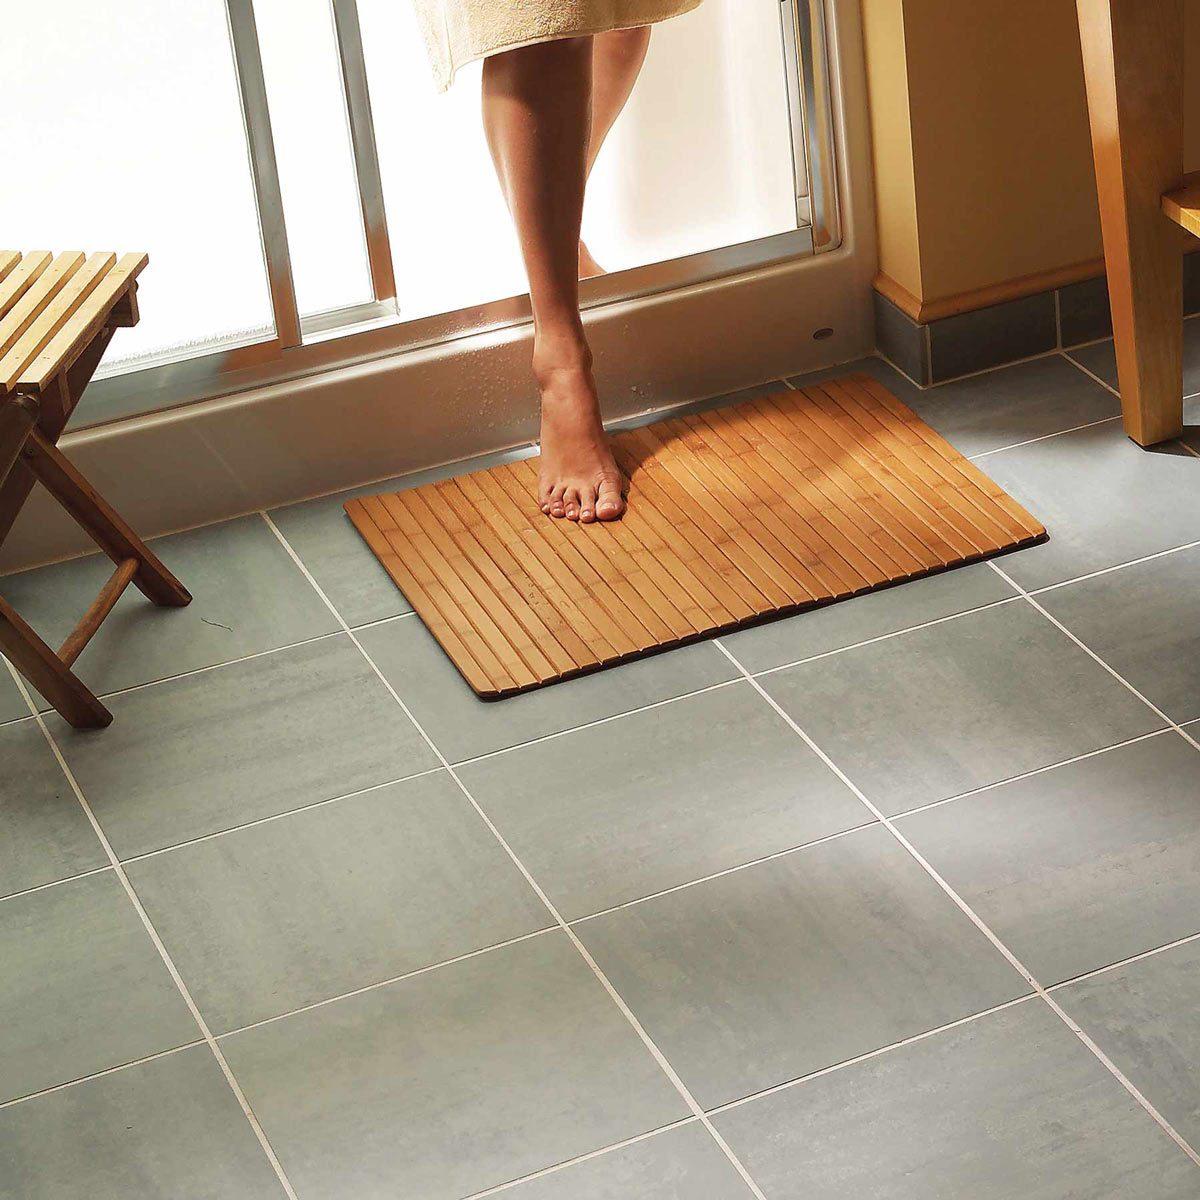 bathroom tile floor after